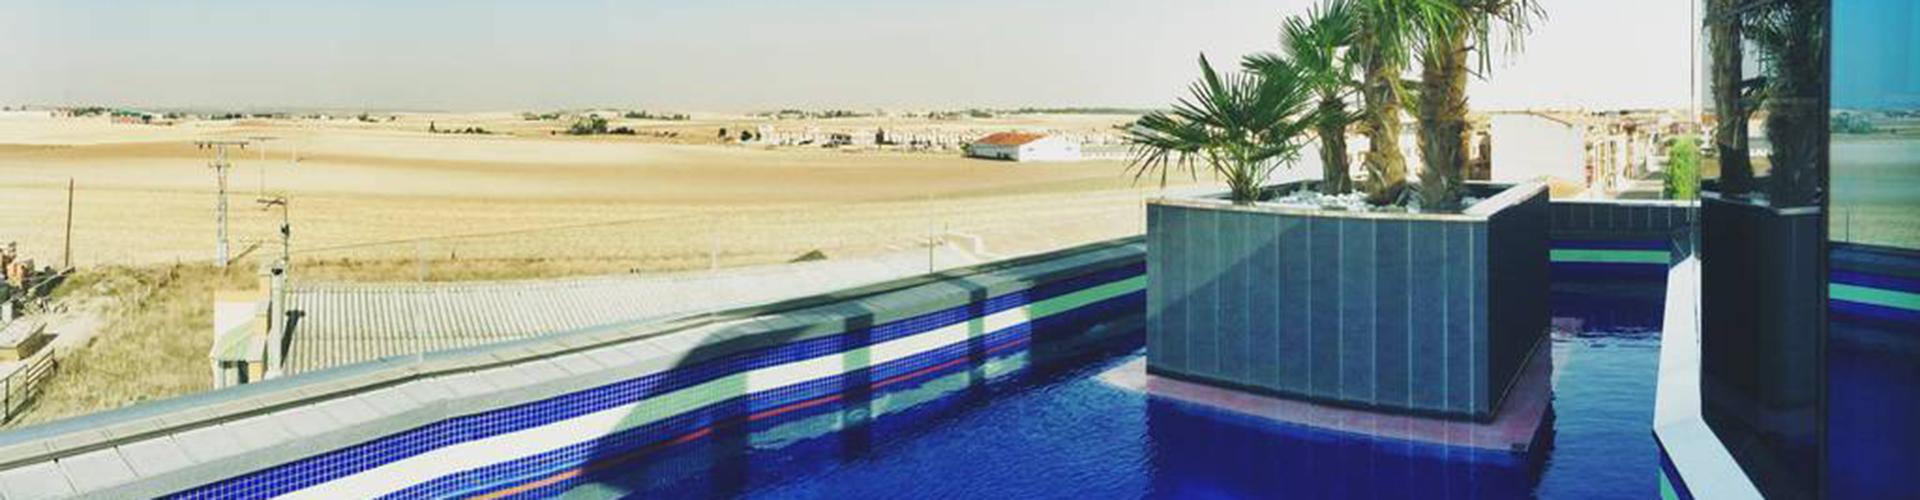 RESOTEL exterior piscina